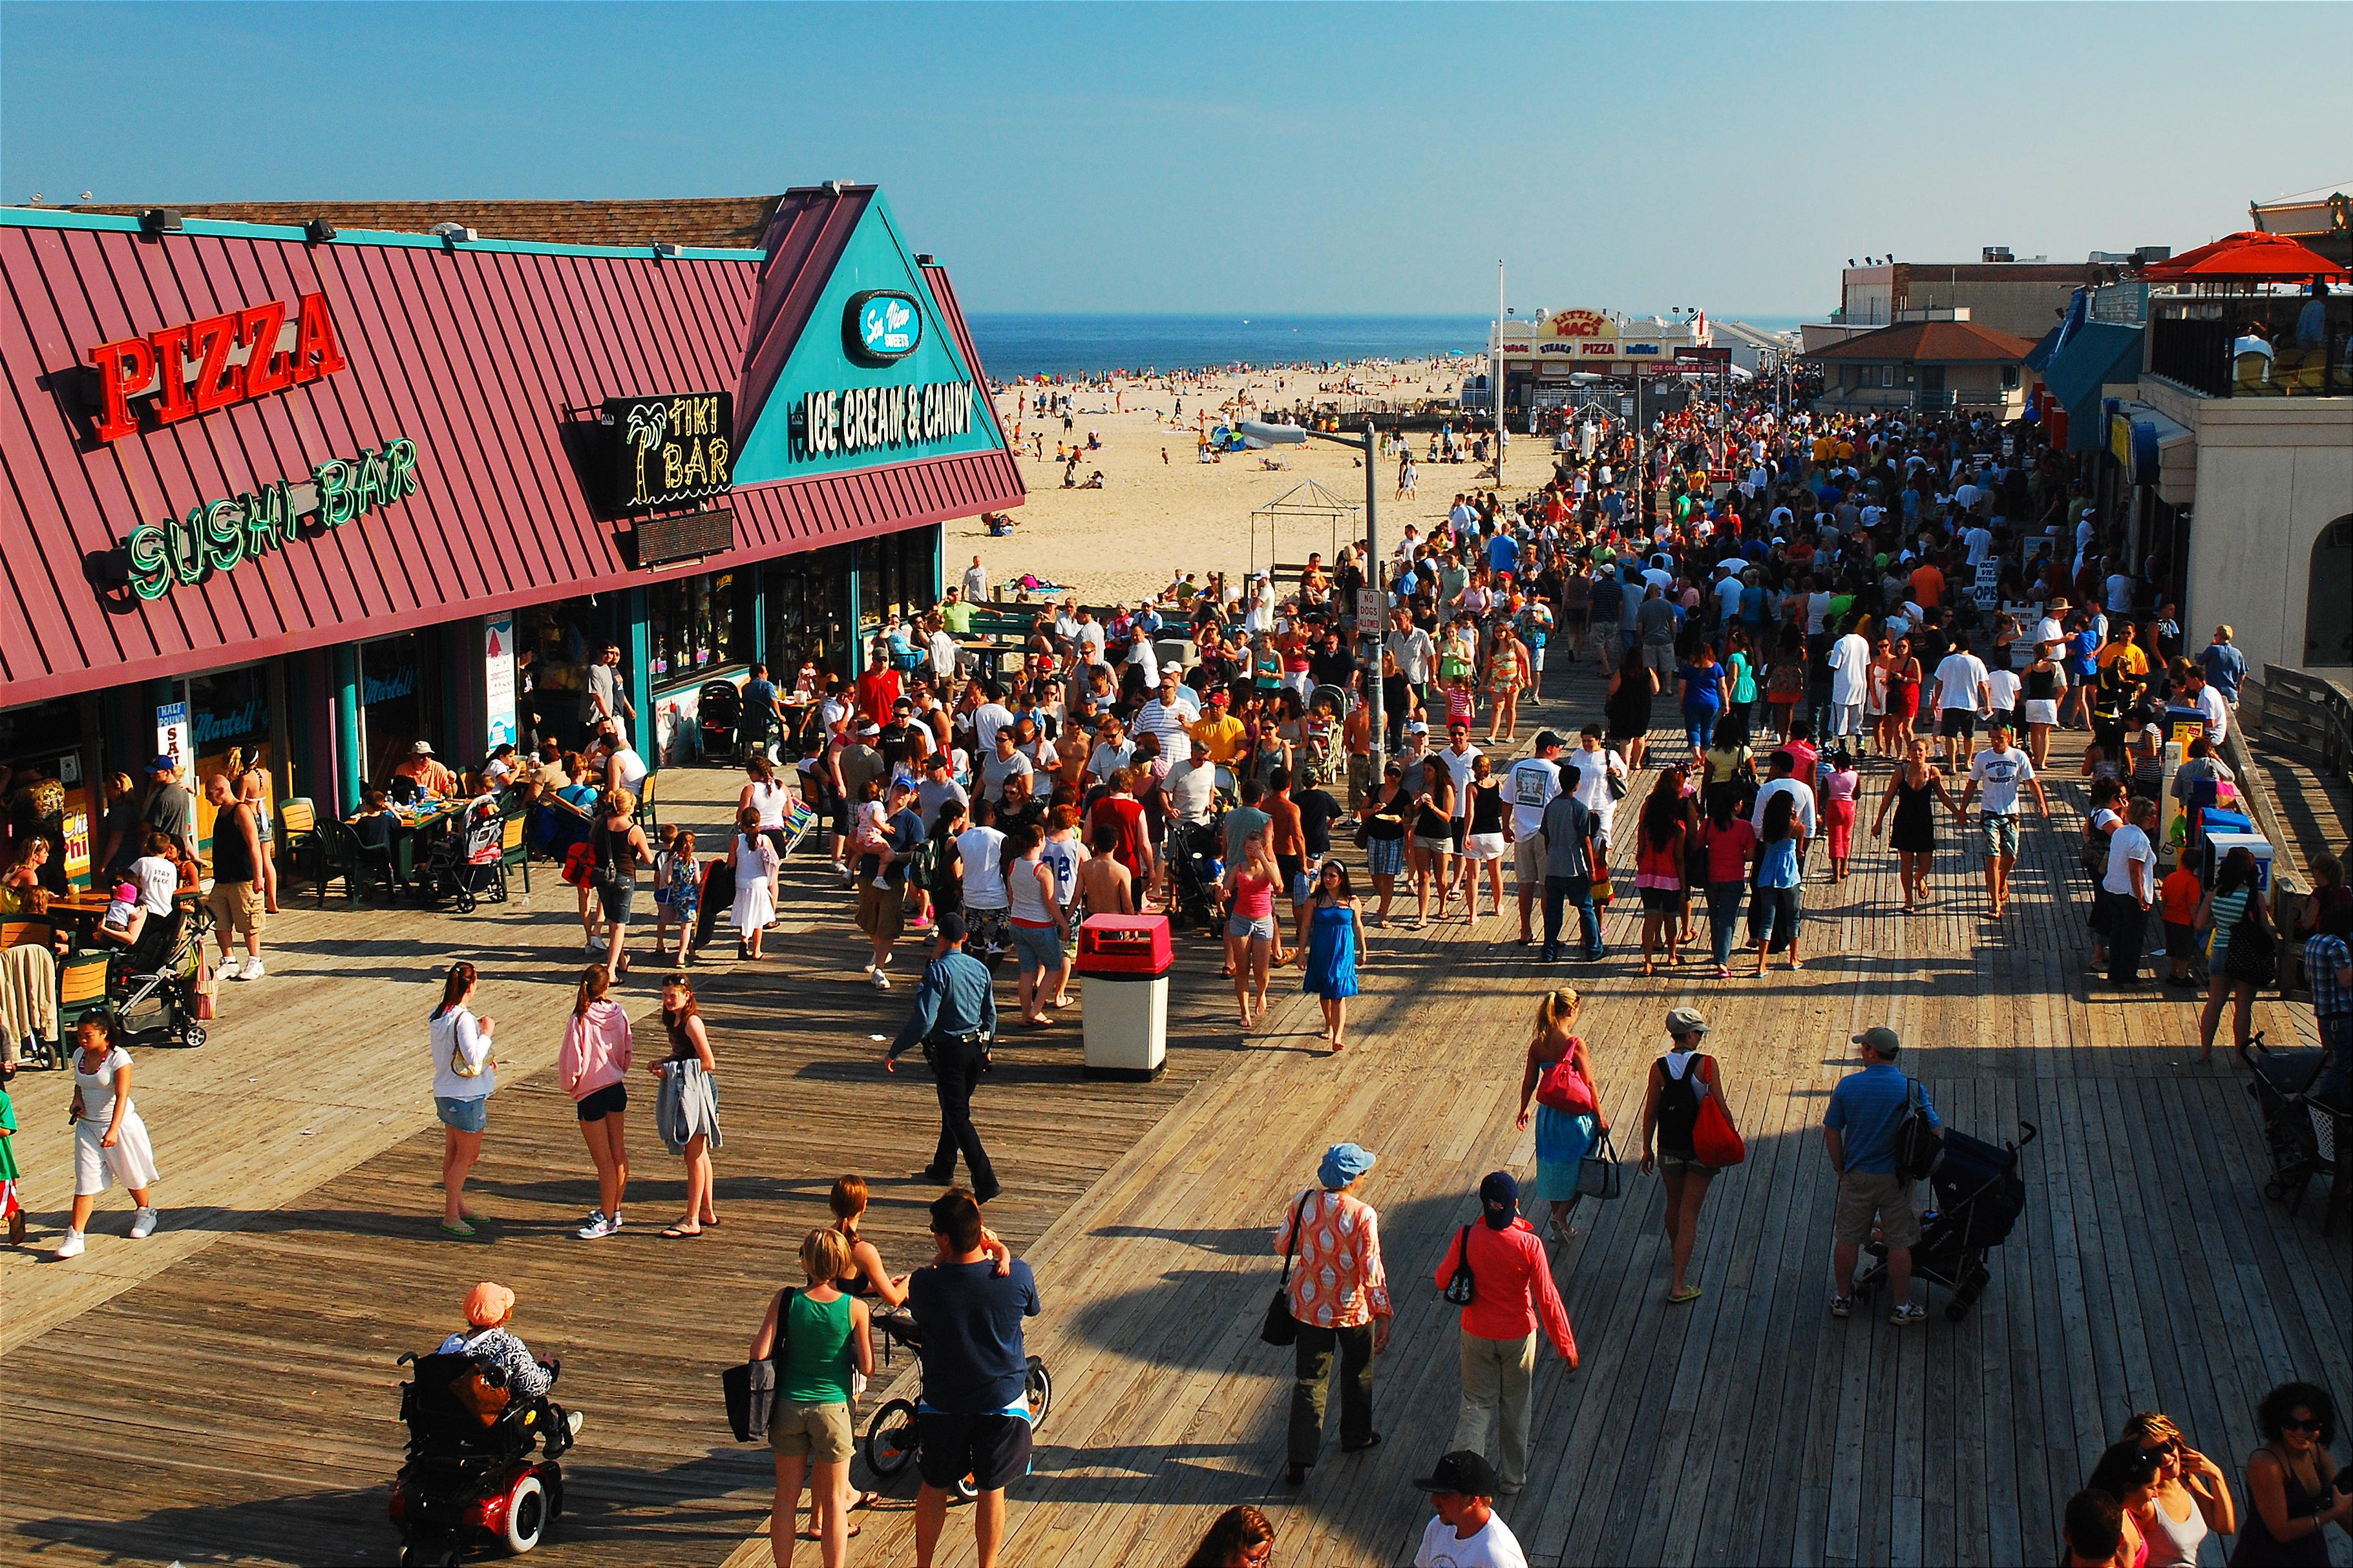 The Point Pleasant boardwalk